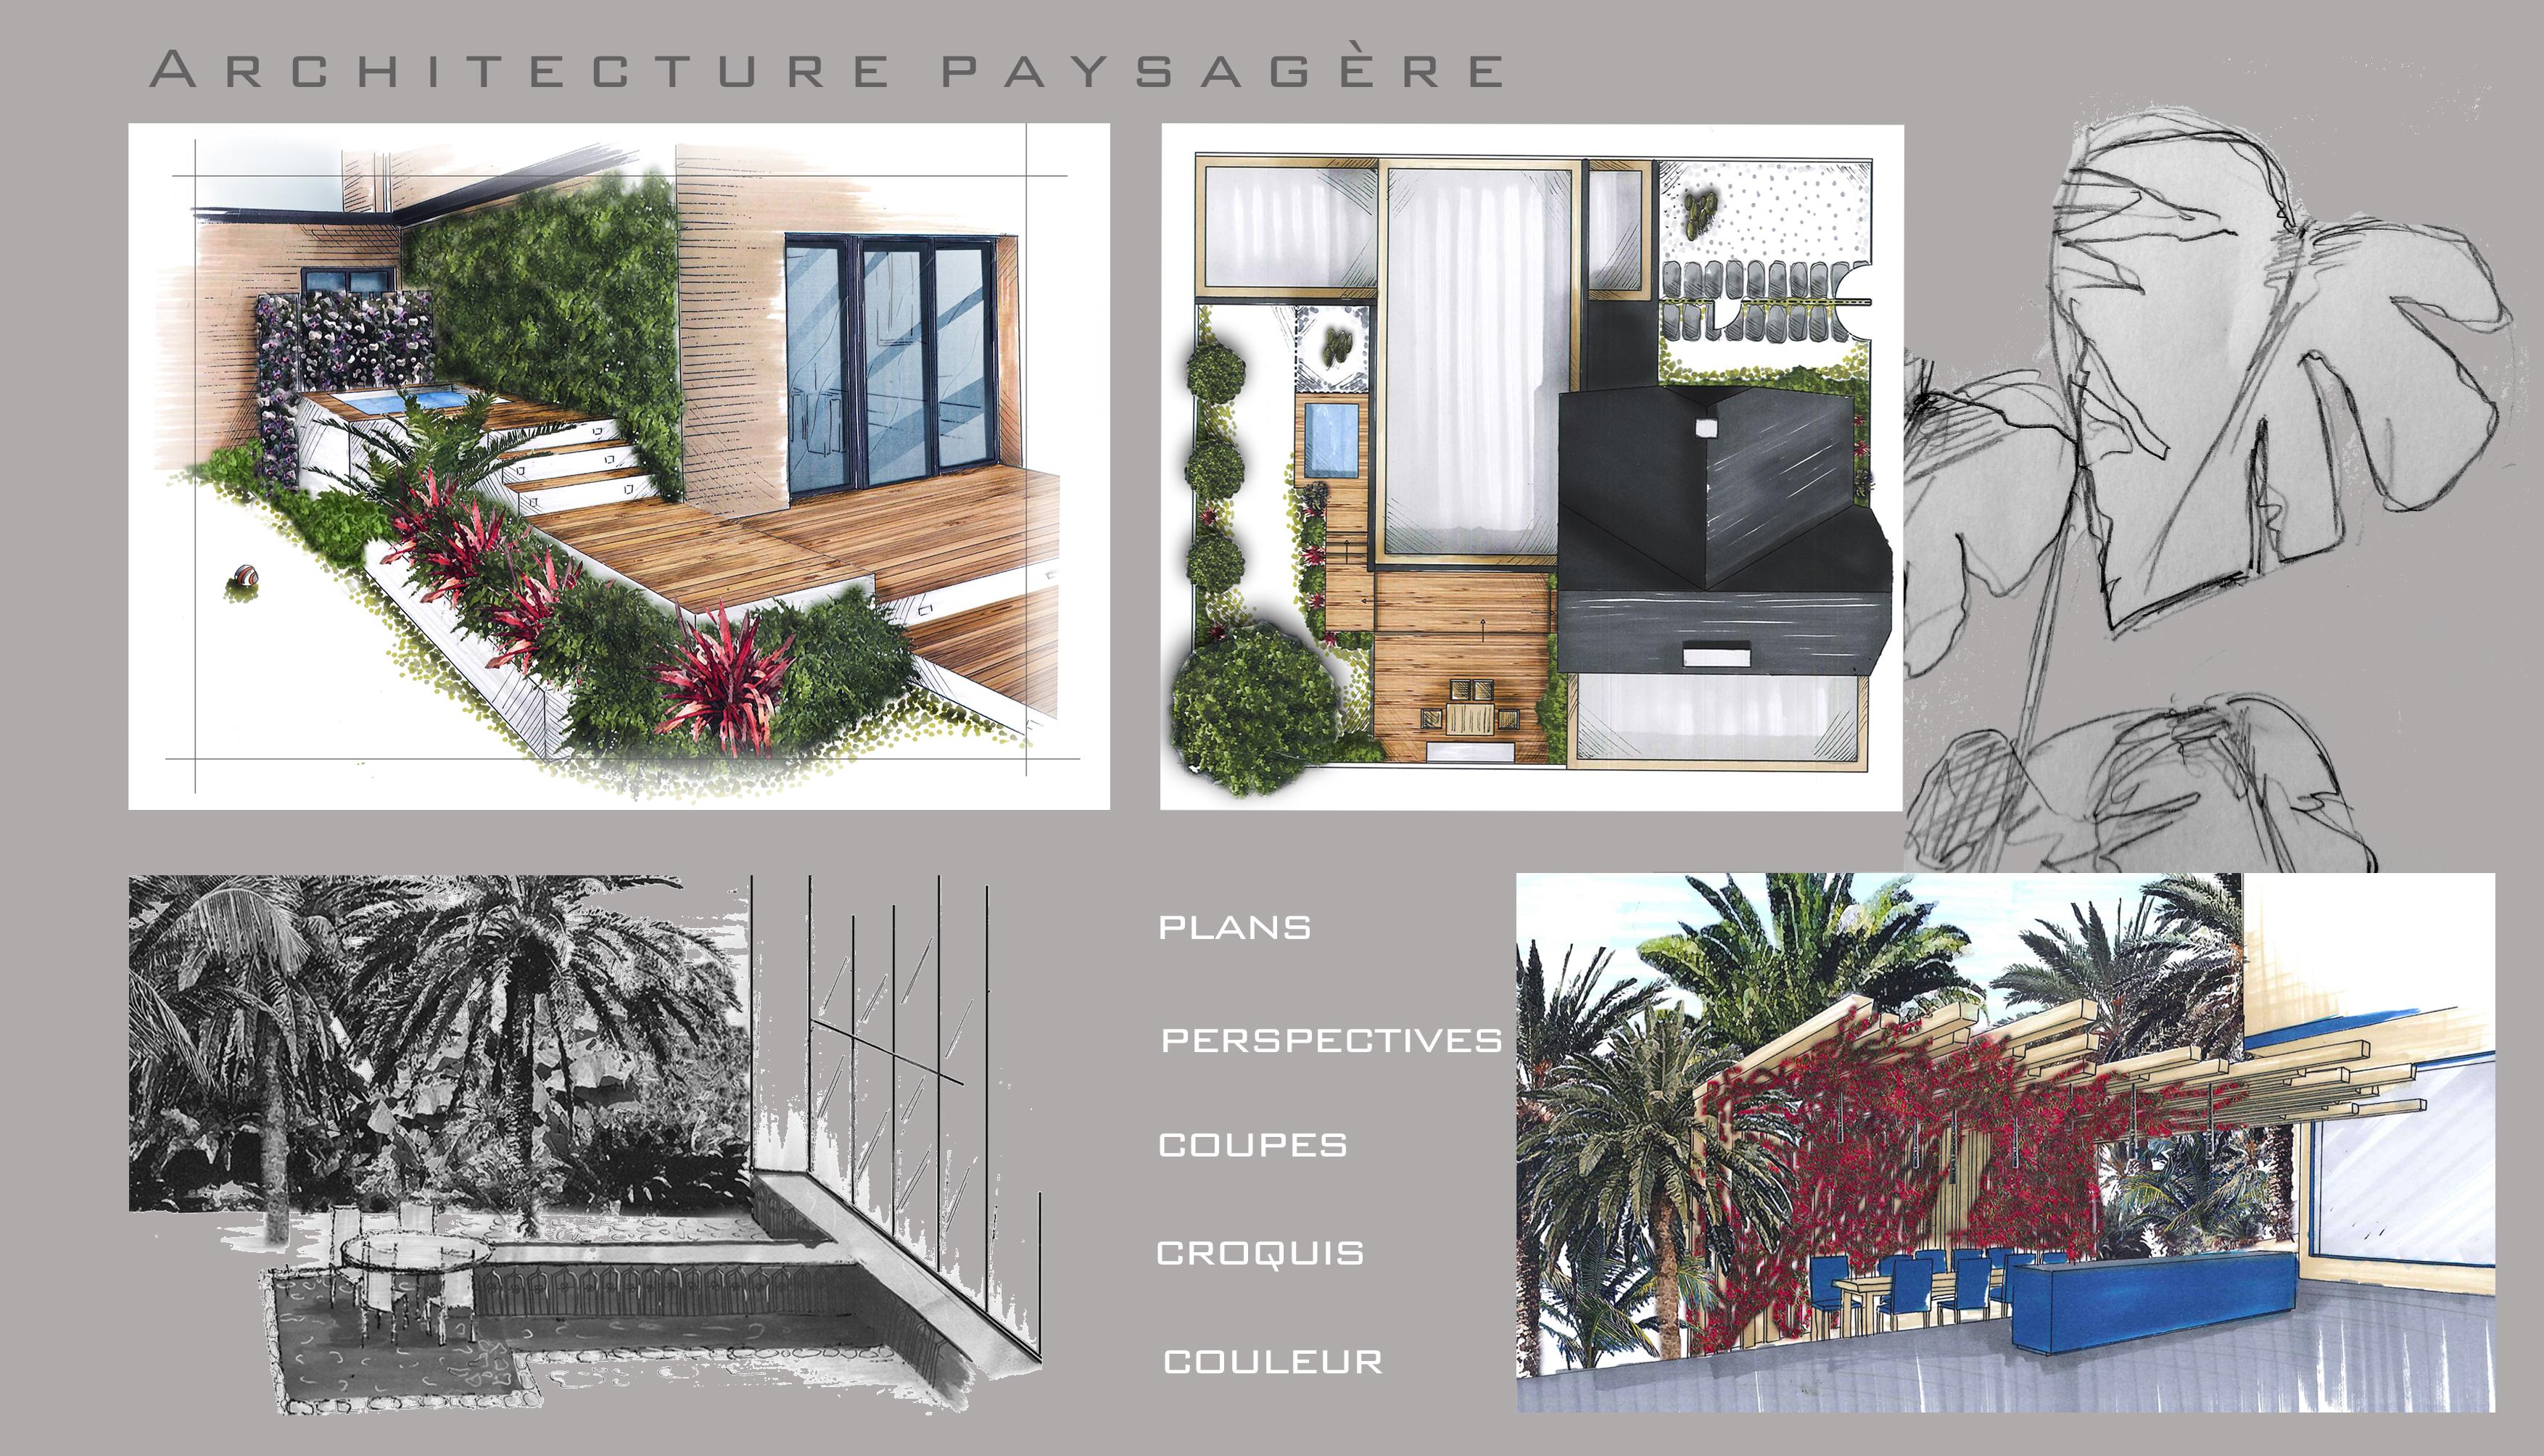 e book cindy hannier architecte d 39 int rieur designer. Black Bedroom Furniture Sets. Home Design Ideas